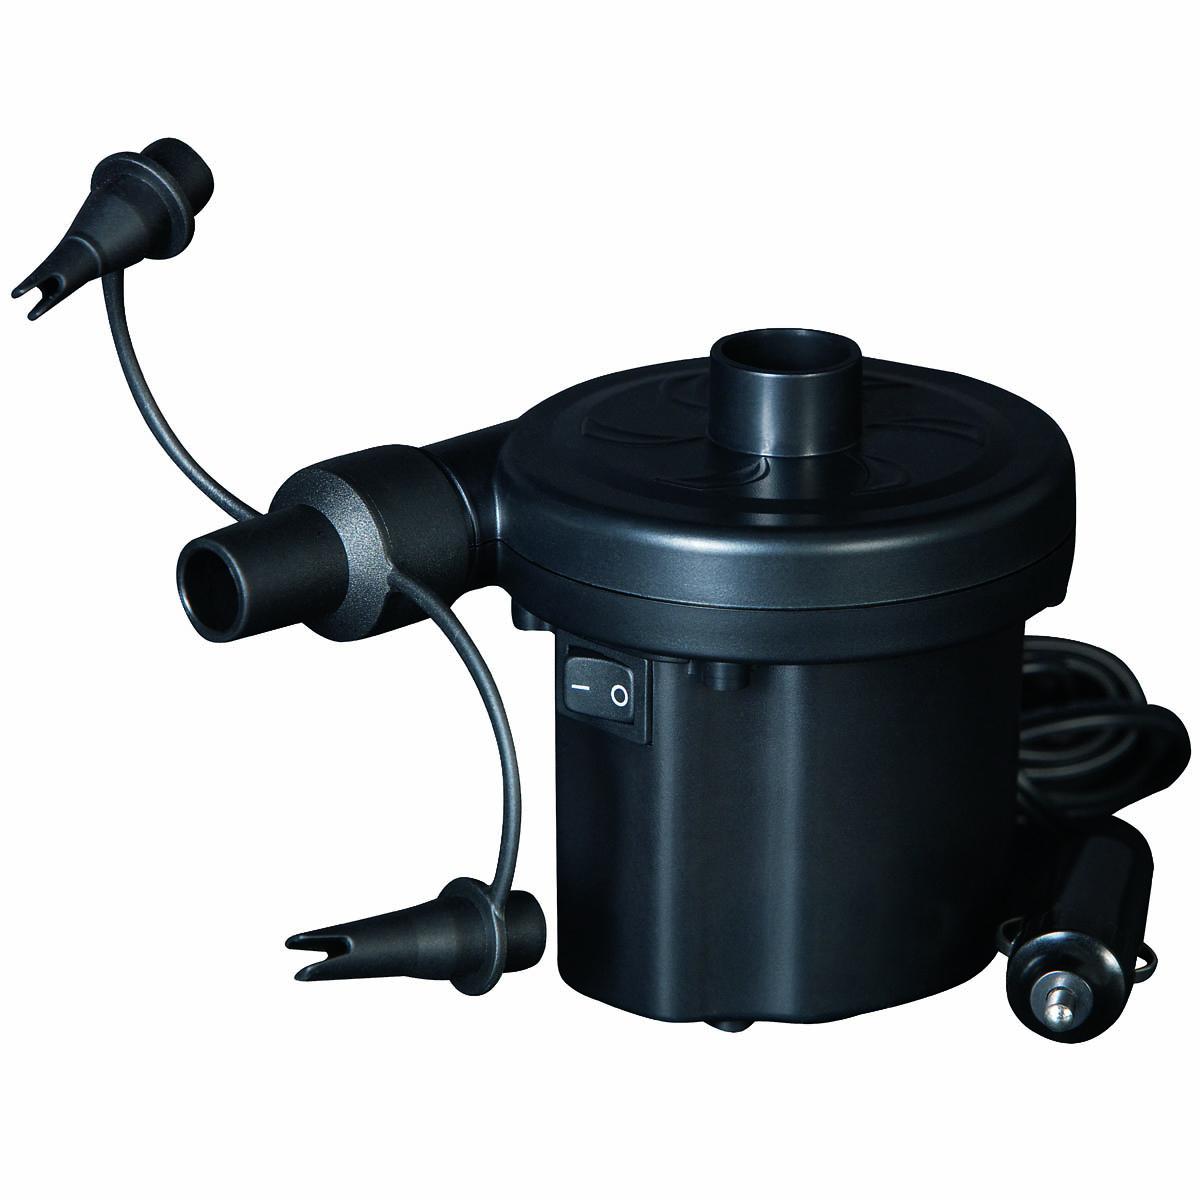 Bestway Pumpa vzduchová elektrická 12 V